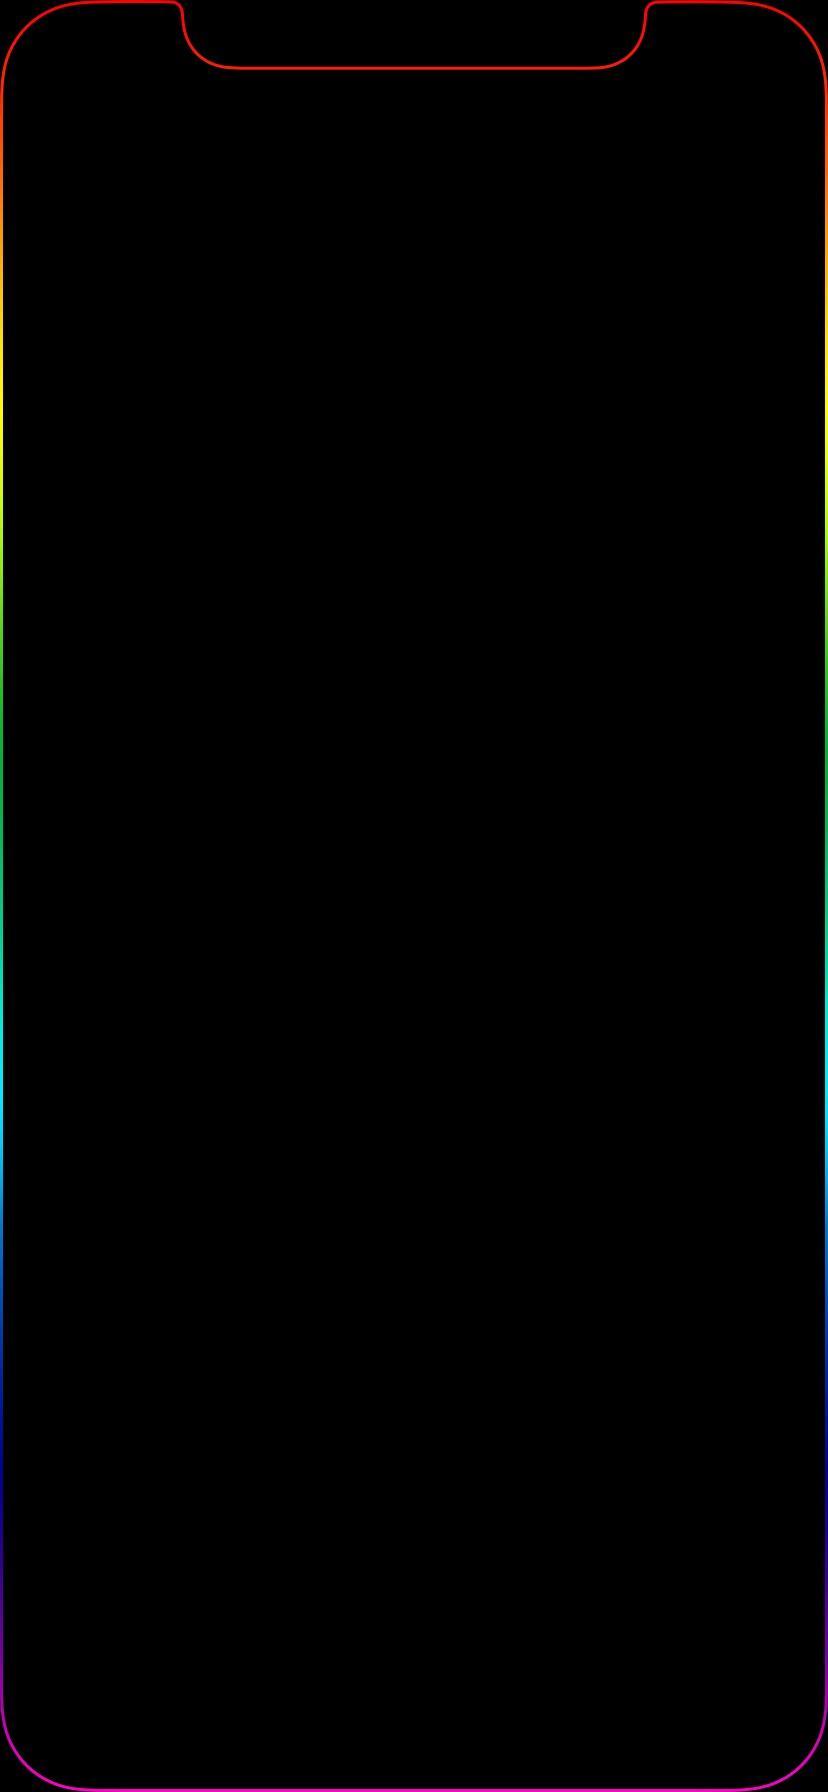 Iphone Xr Outline Wallpaper Hd